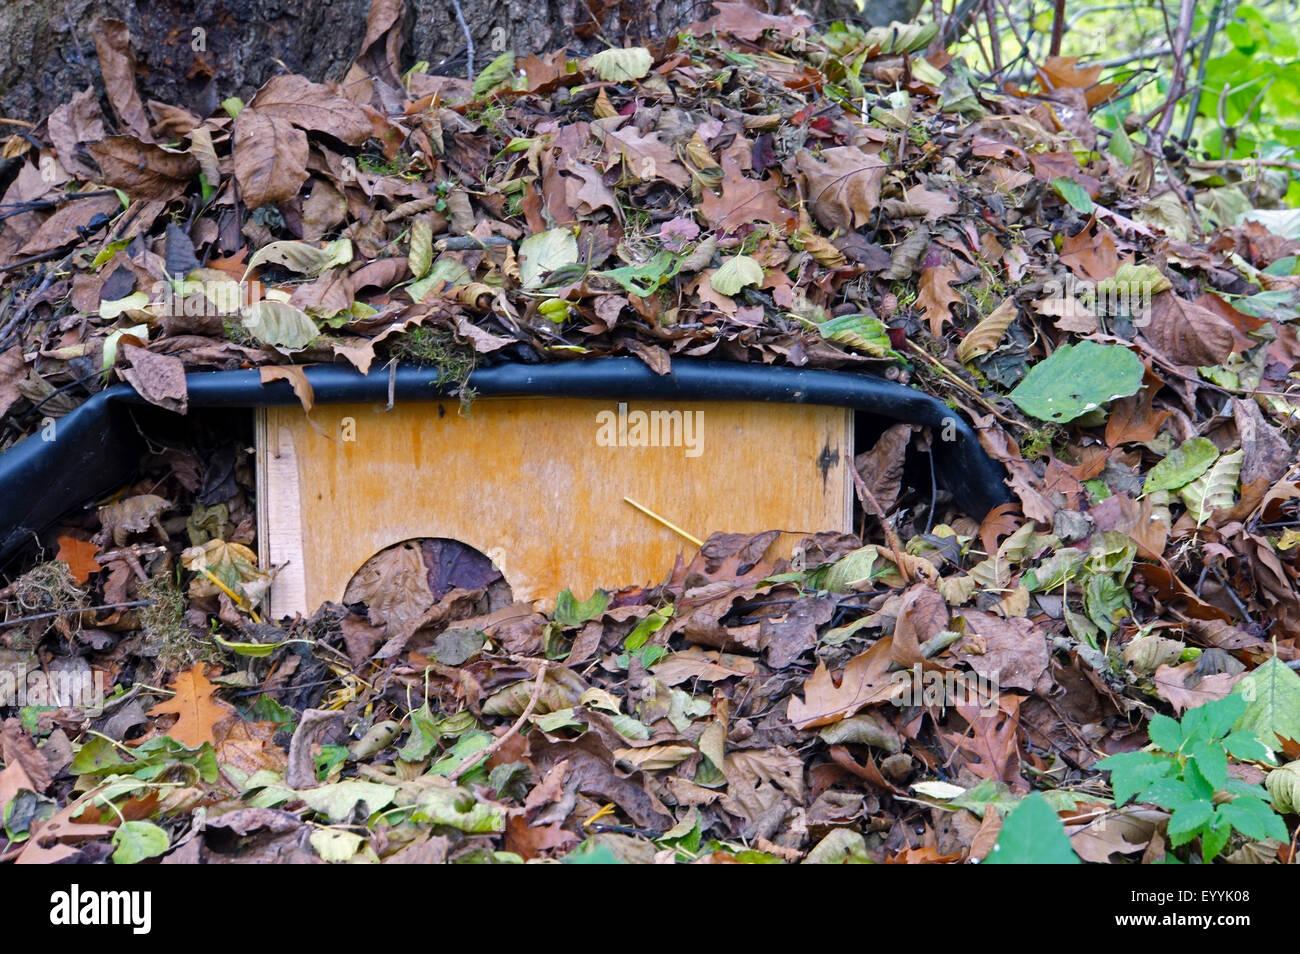 Western hedgehog, European hedgehog (Erinaceus europaeus), hedgehog house for overwintering, Germany, North Rhine - Stock Image